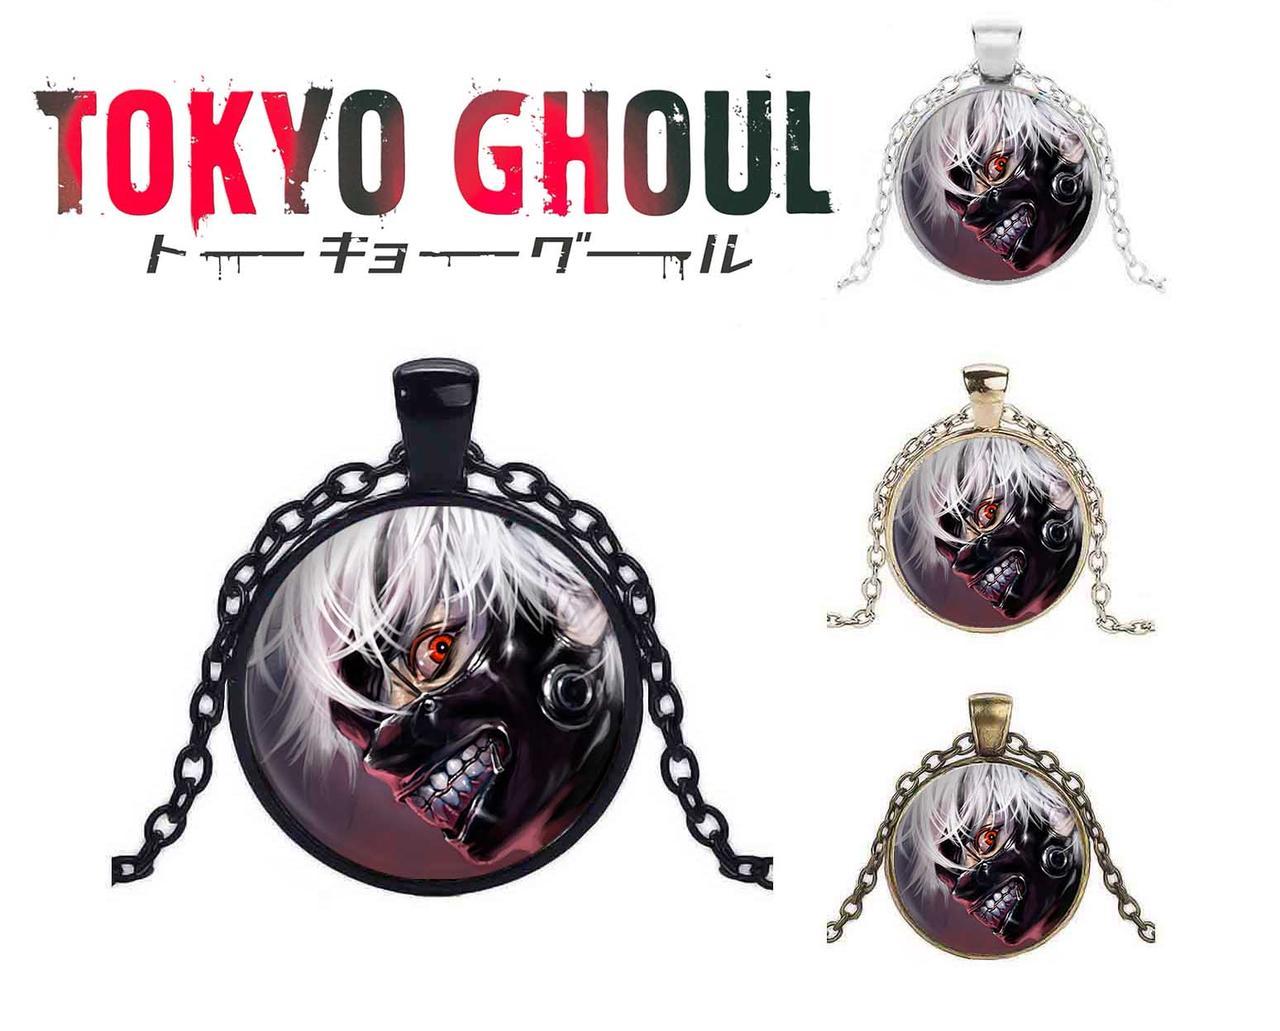 Кулон голодный Кэн Токийский гуль  / Tokyo Ghoul